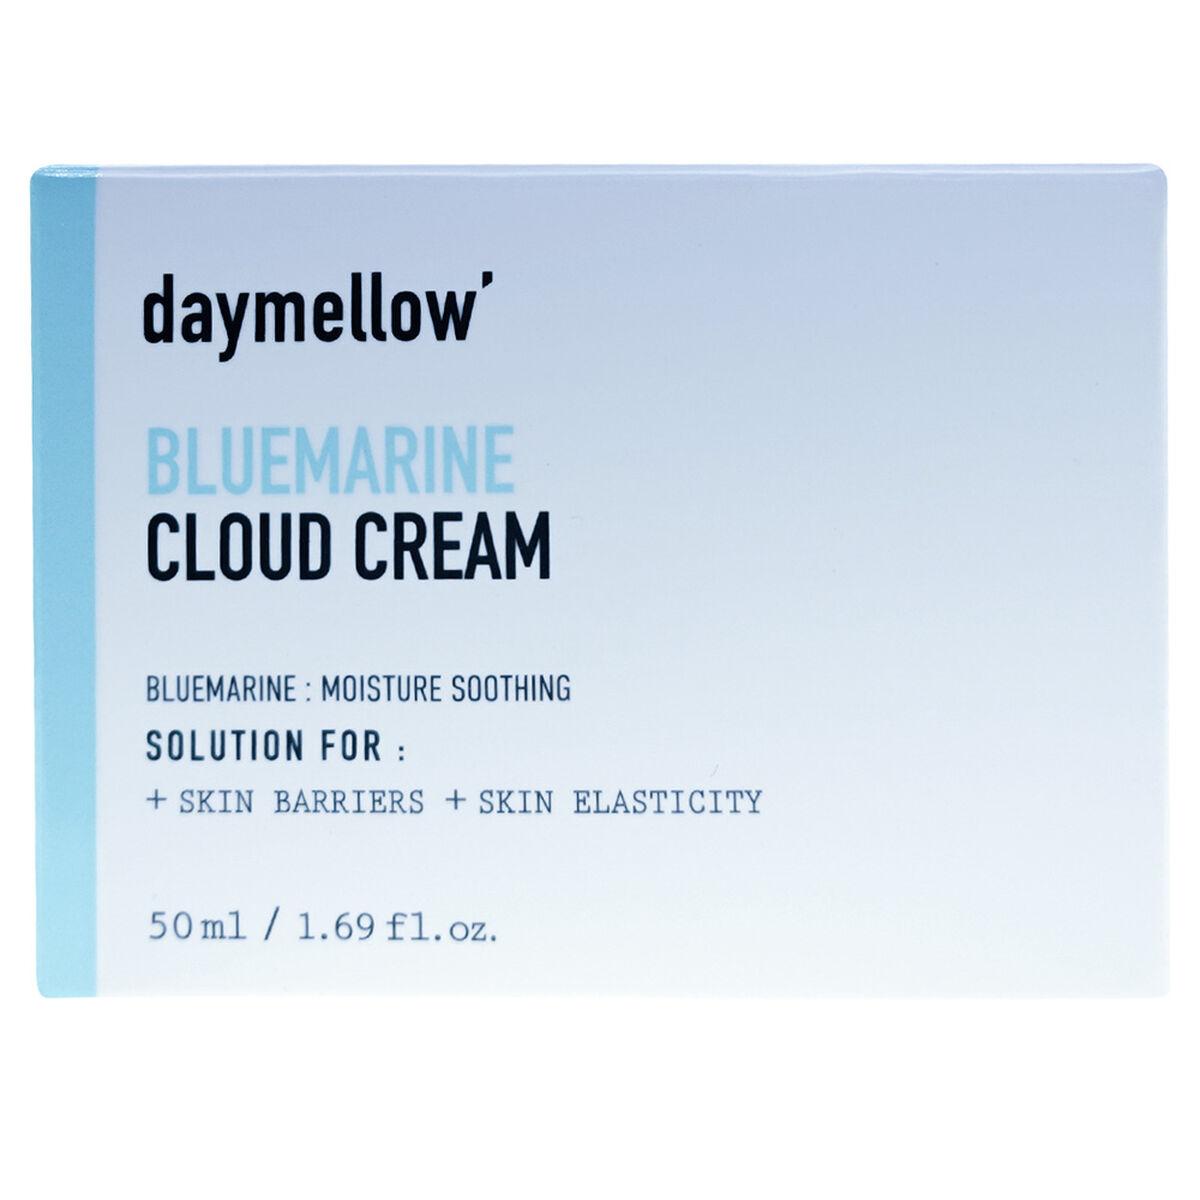 Bluemarine Cloud Cream